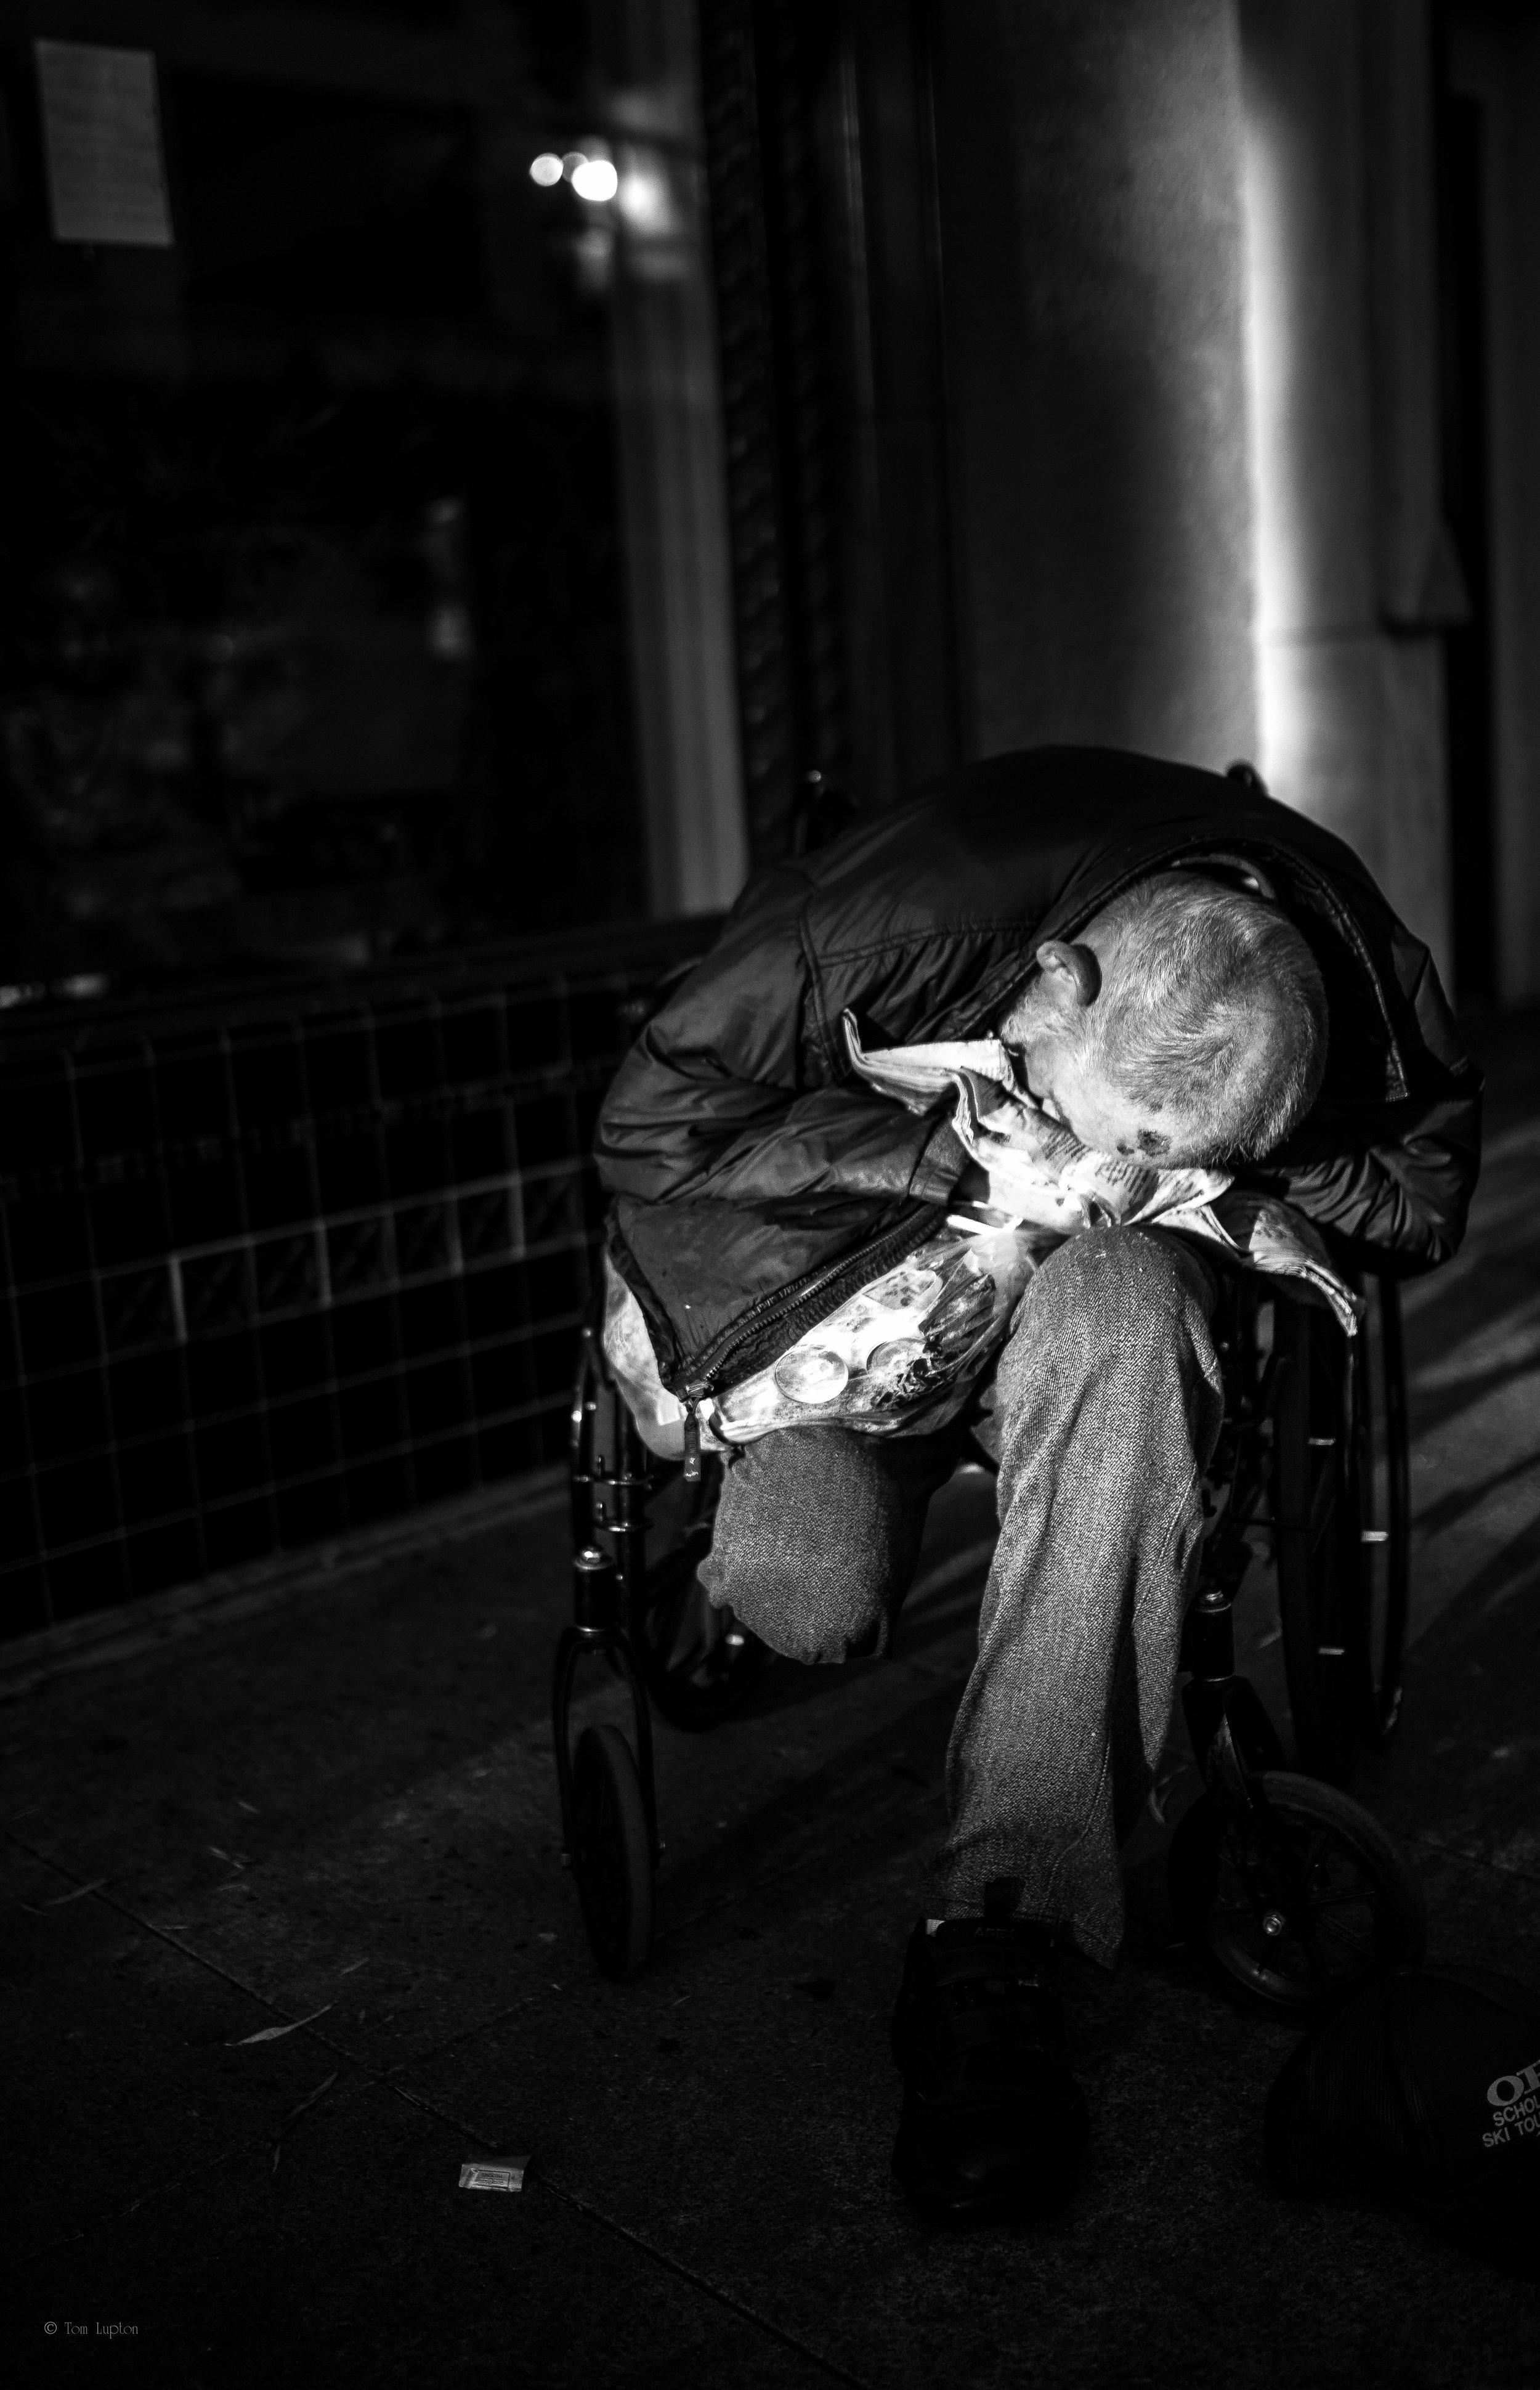 Tom_Lupton_Photography_Homeless.jpg